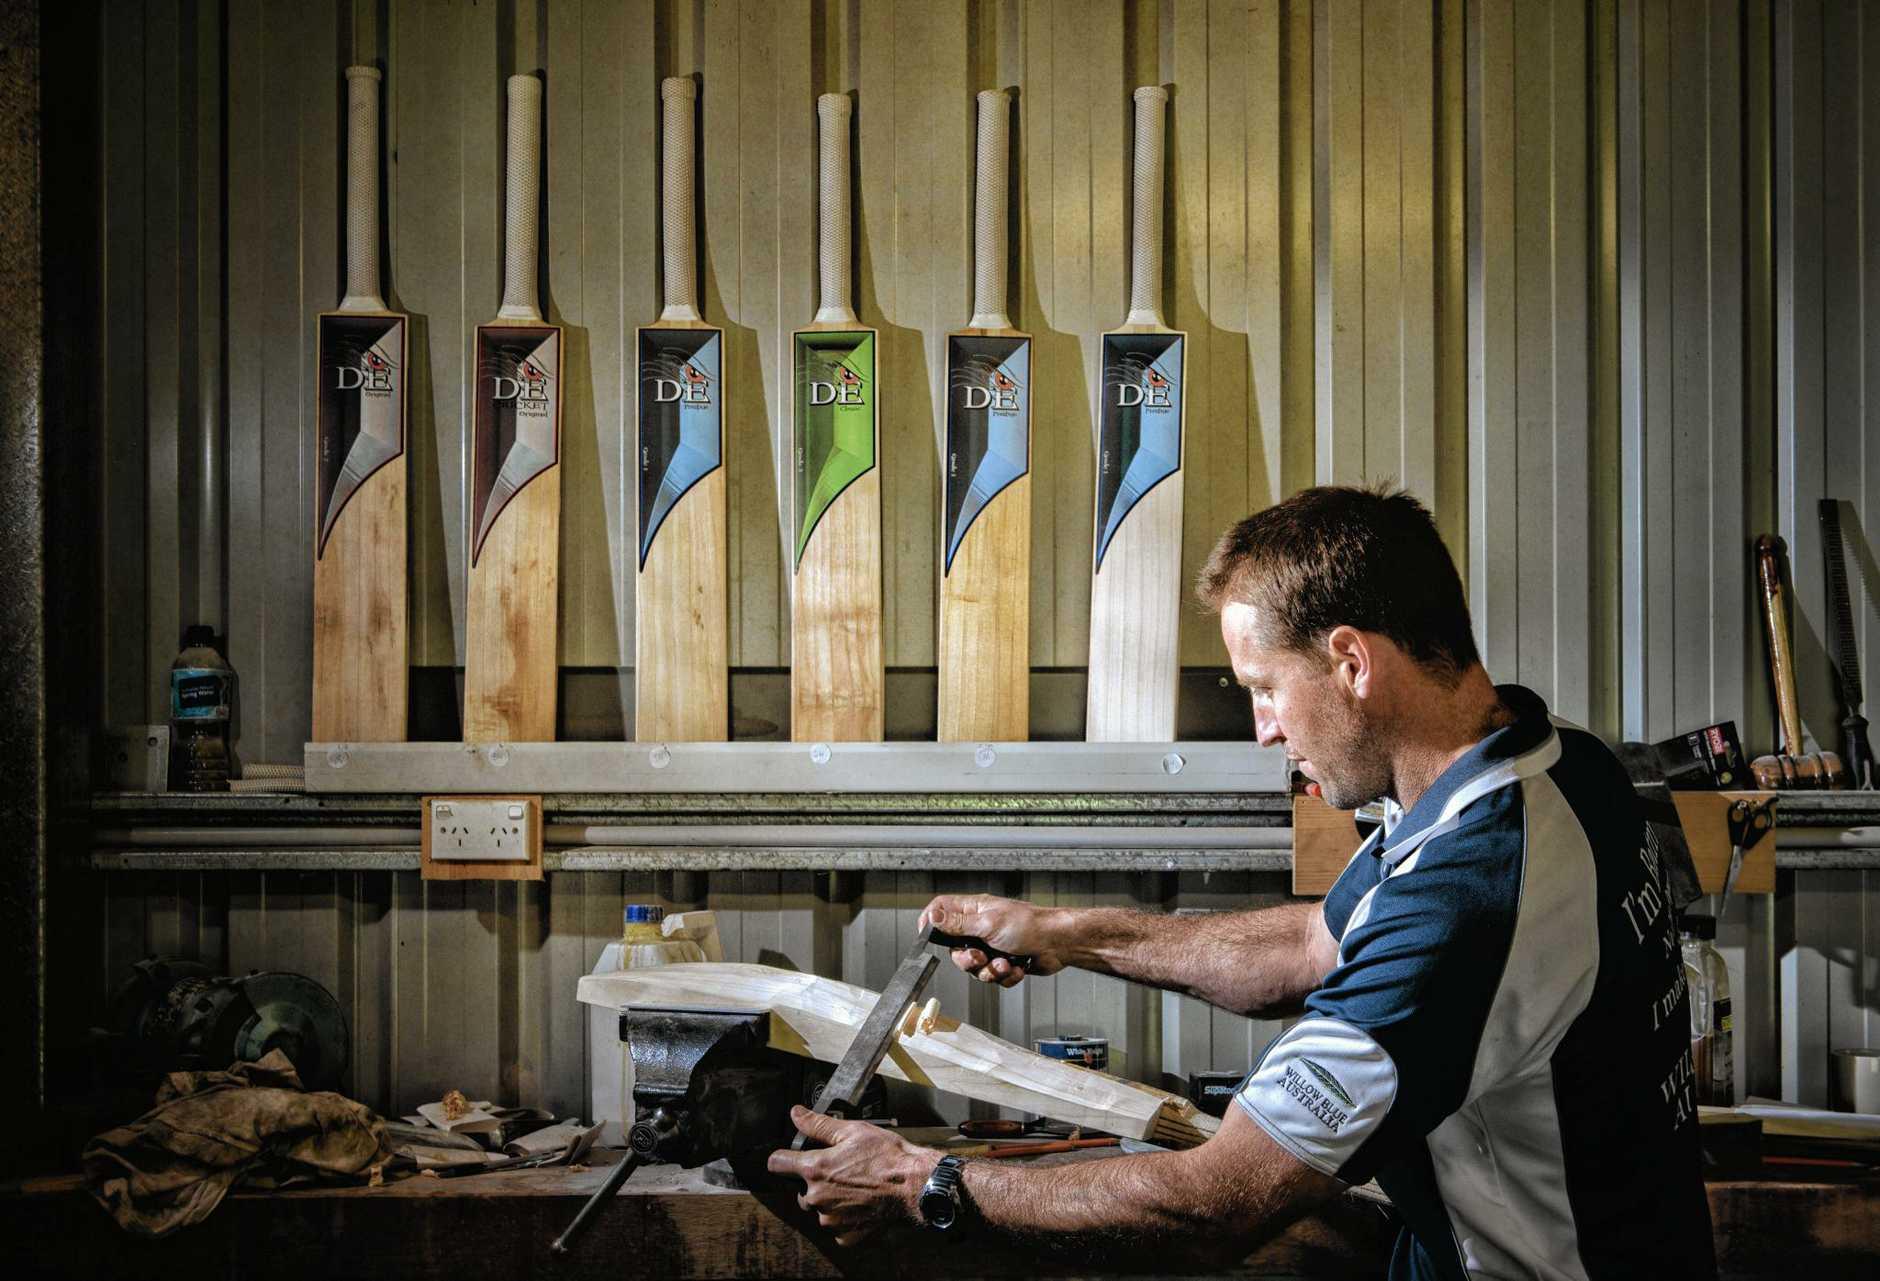 Adam Elliott at work hand shaping cricket bats.